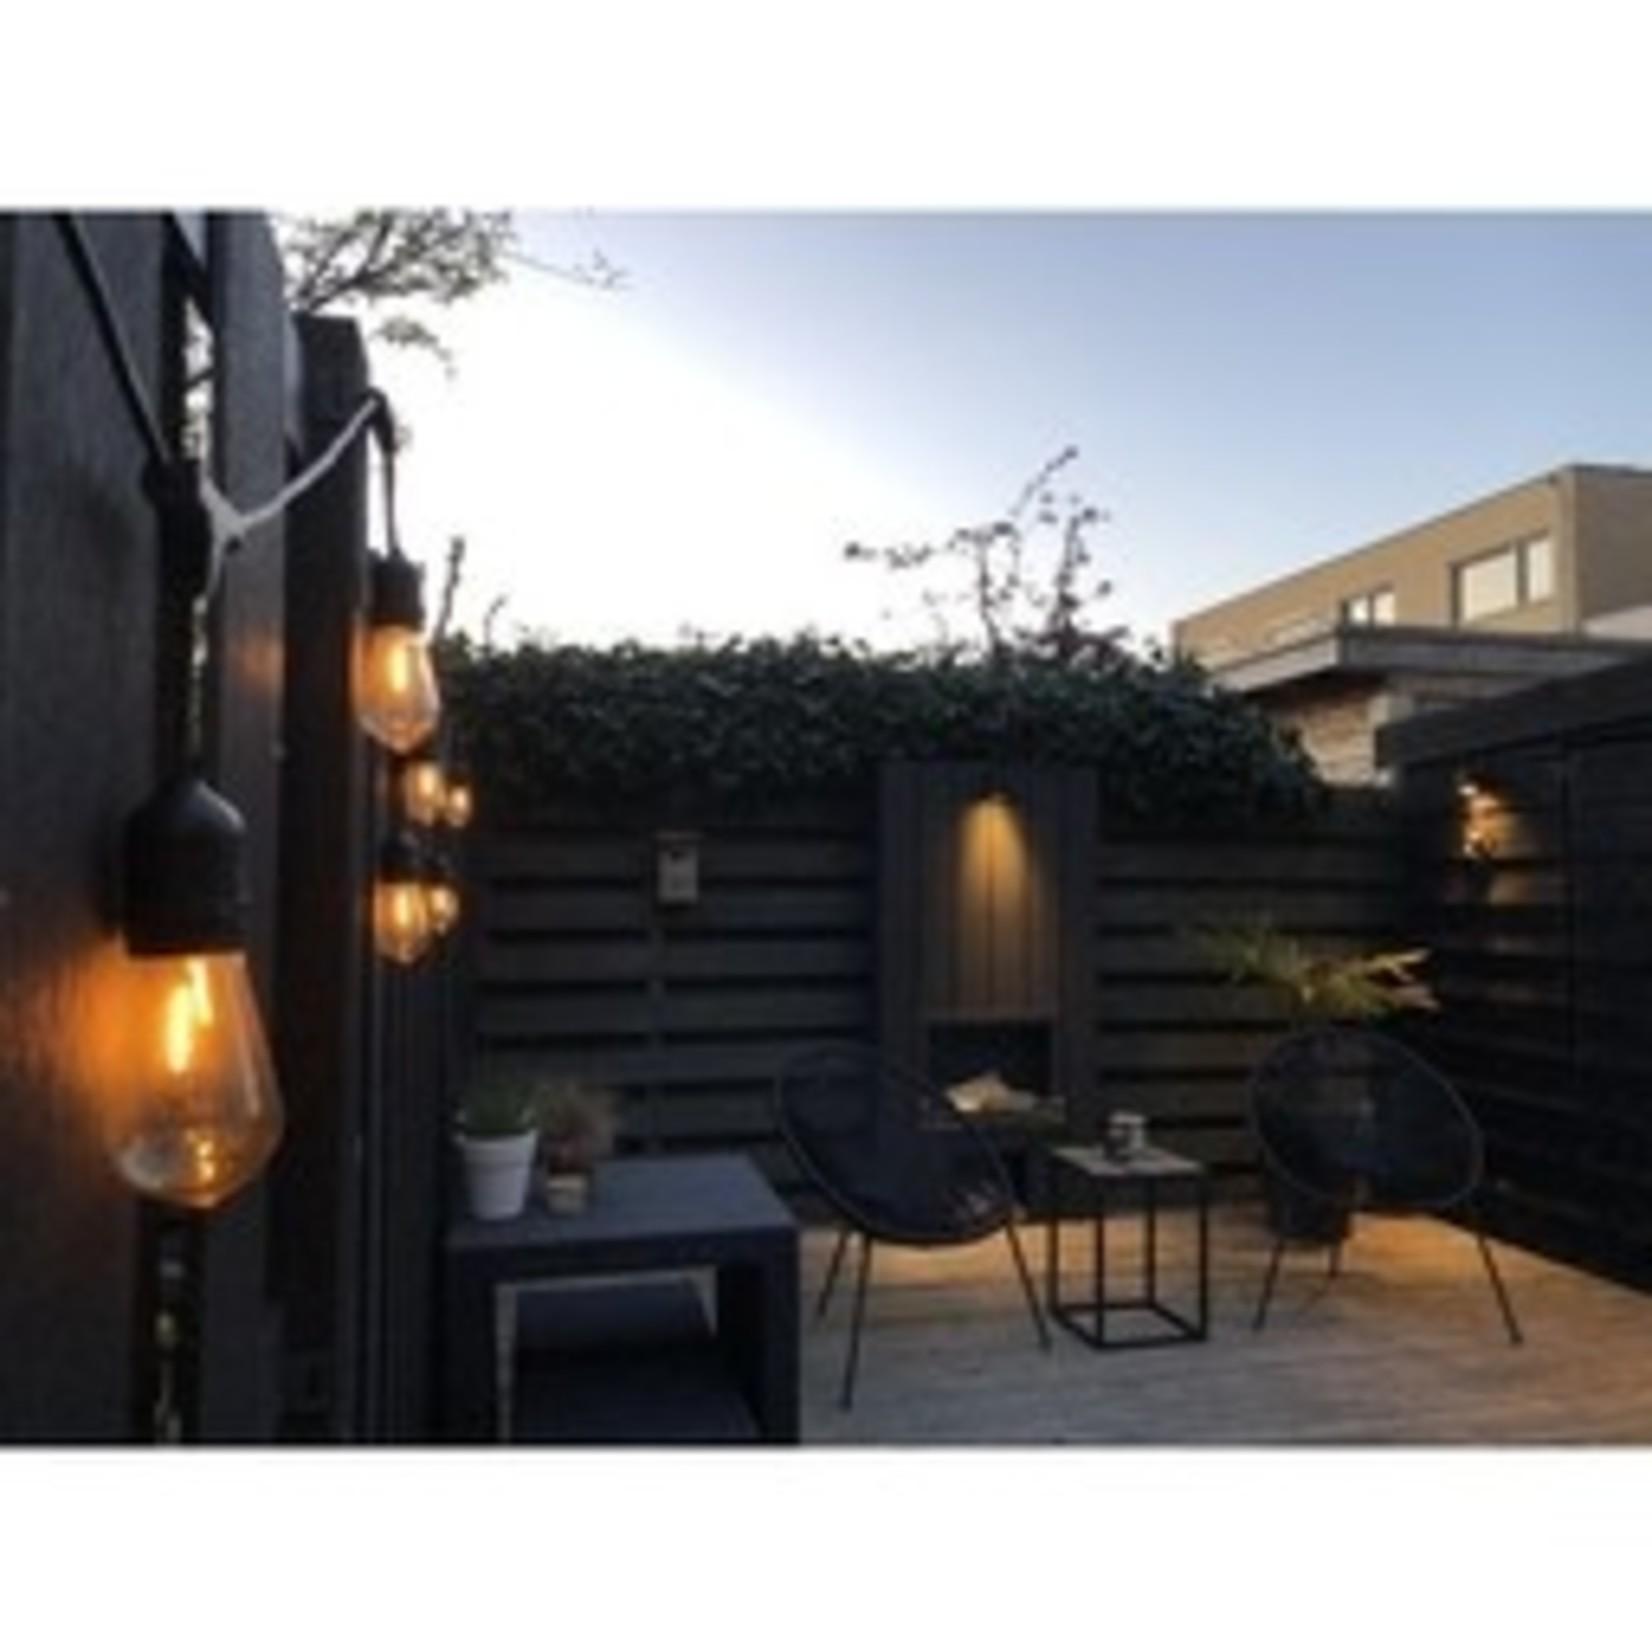 Cotton Ball Lights Premium Patio Lights - Starterskit